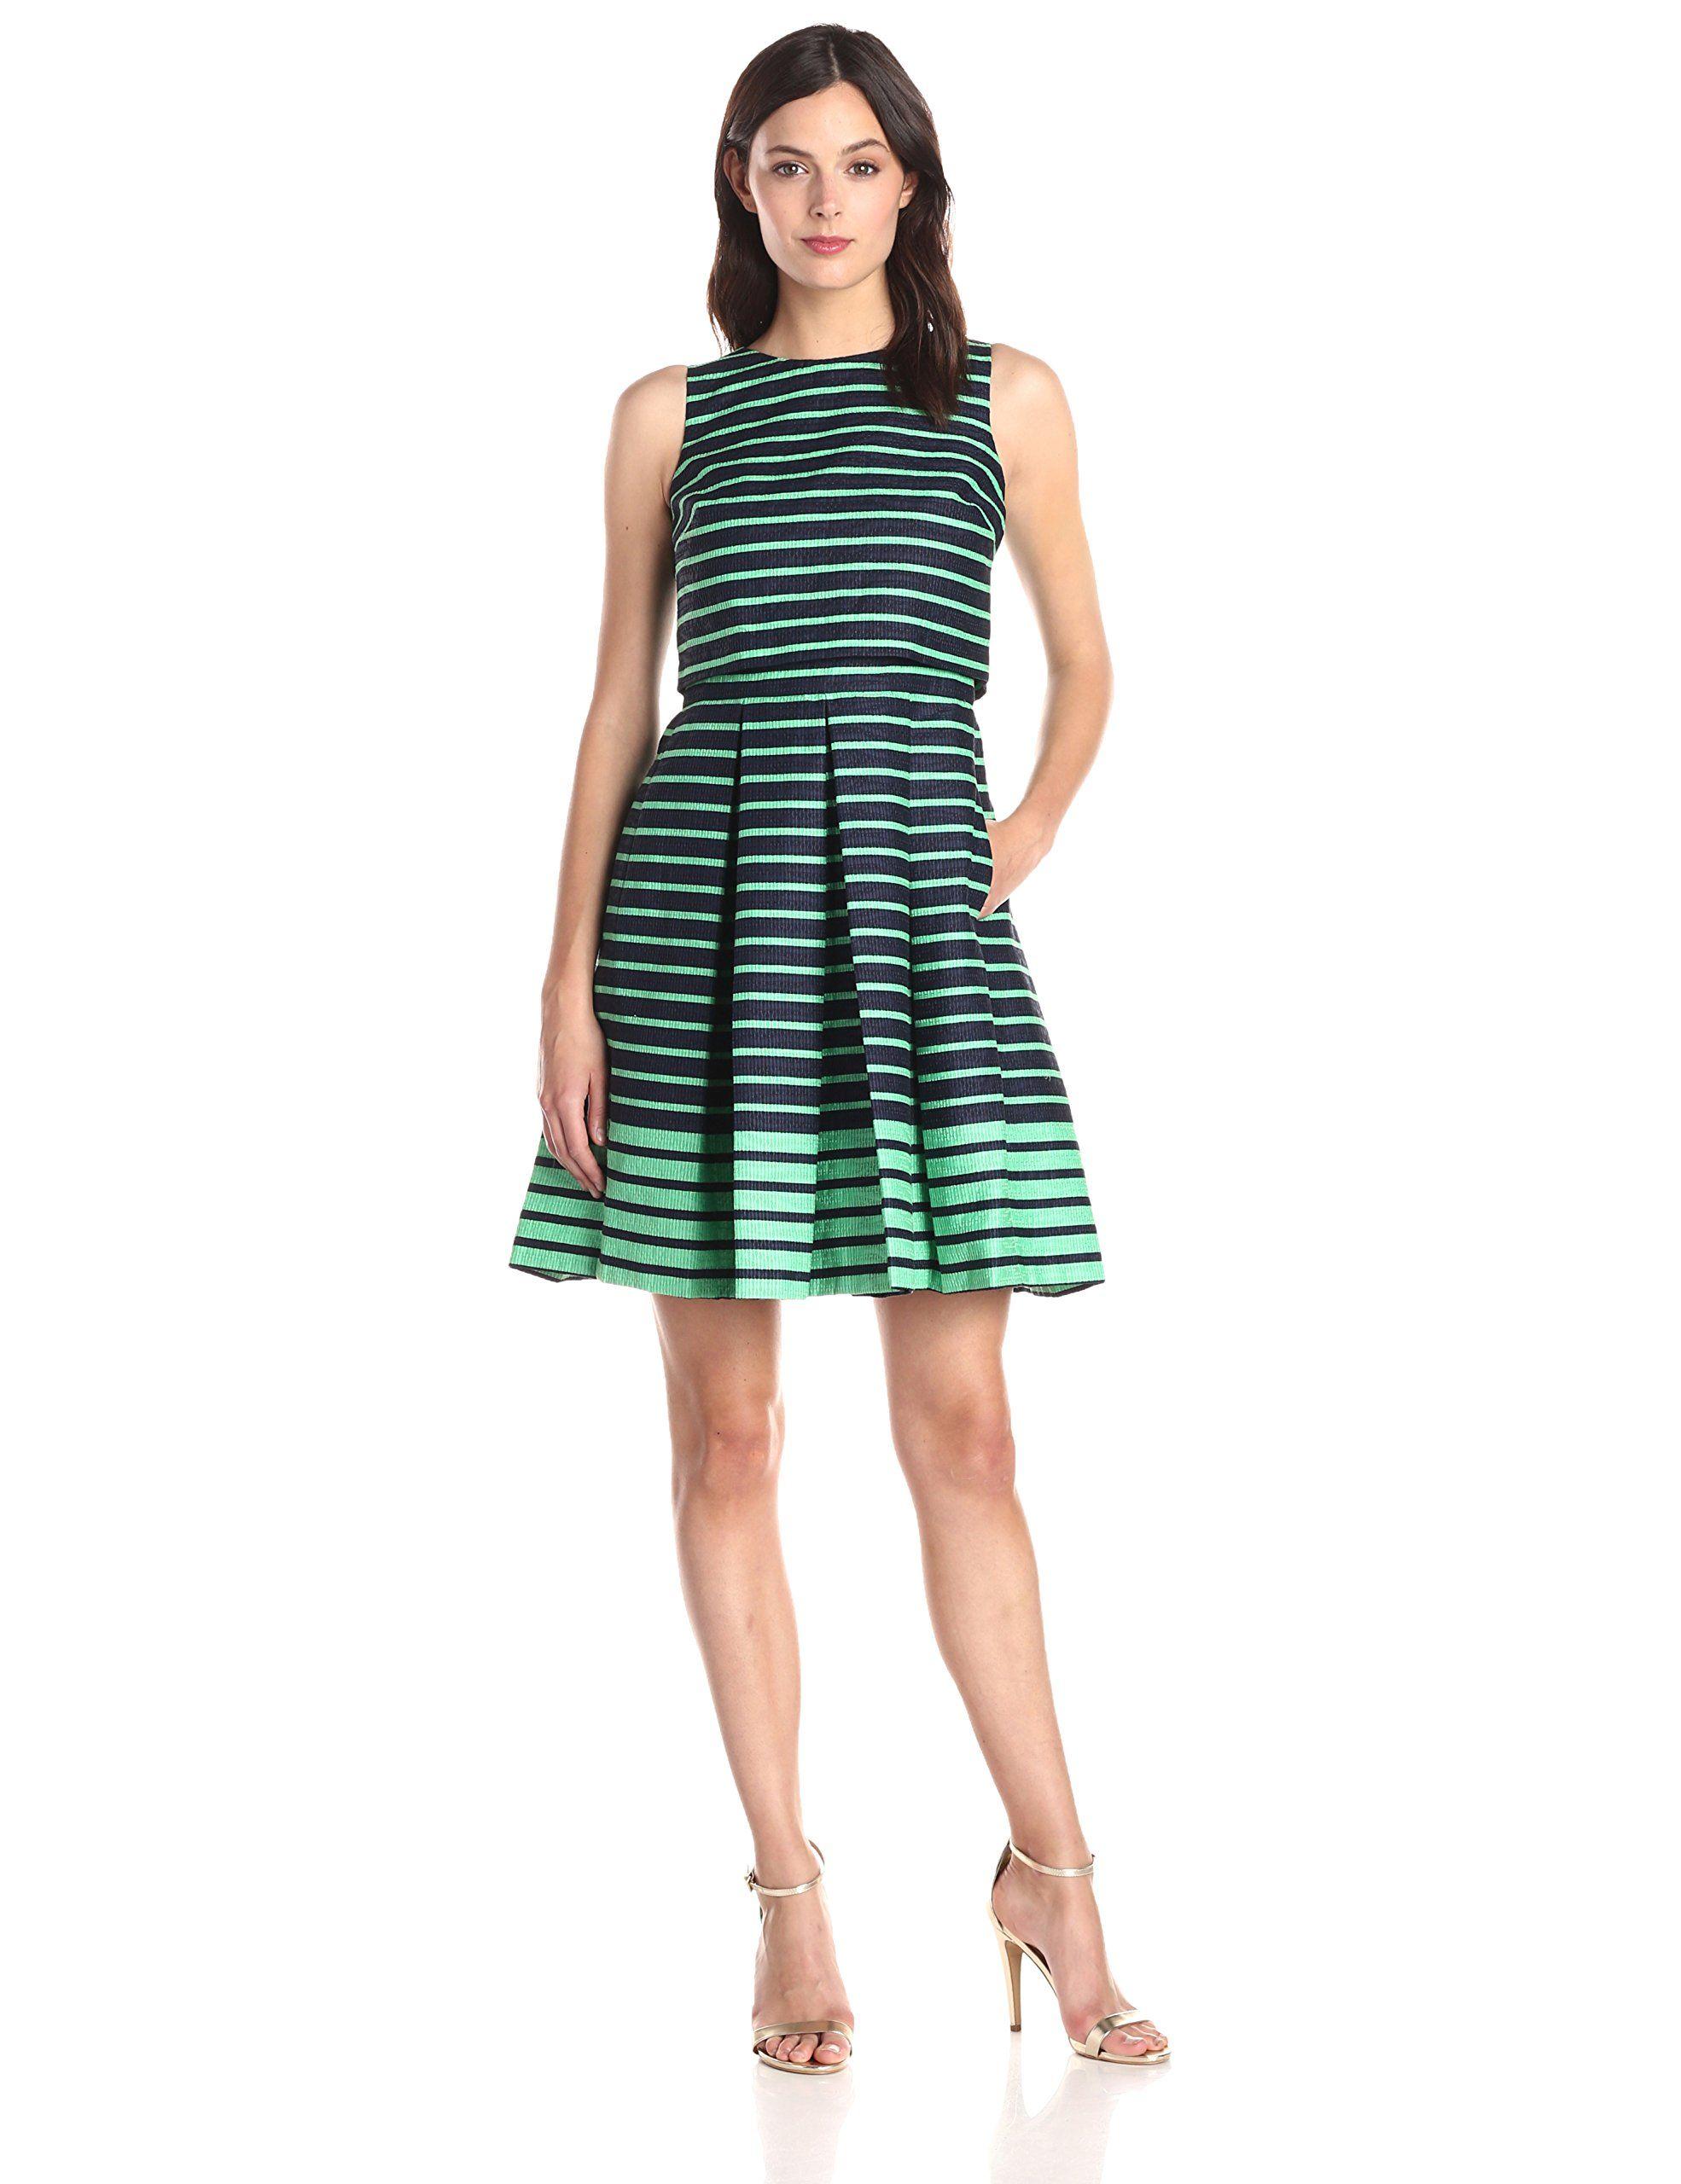 Taylor Dresses Women's Striped Popover Dress, Navy/Green, 10